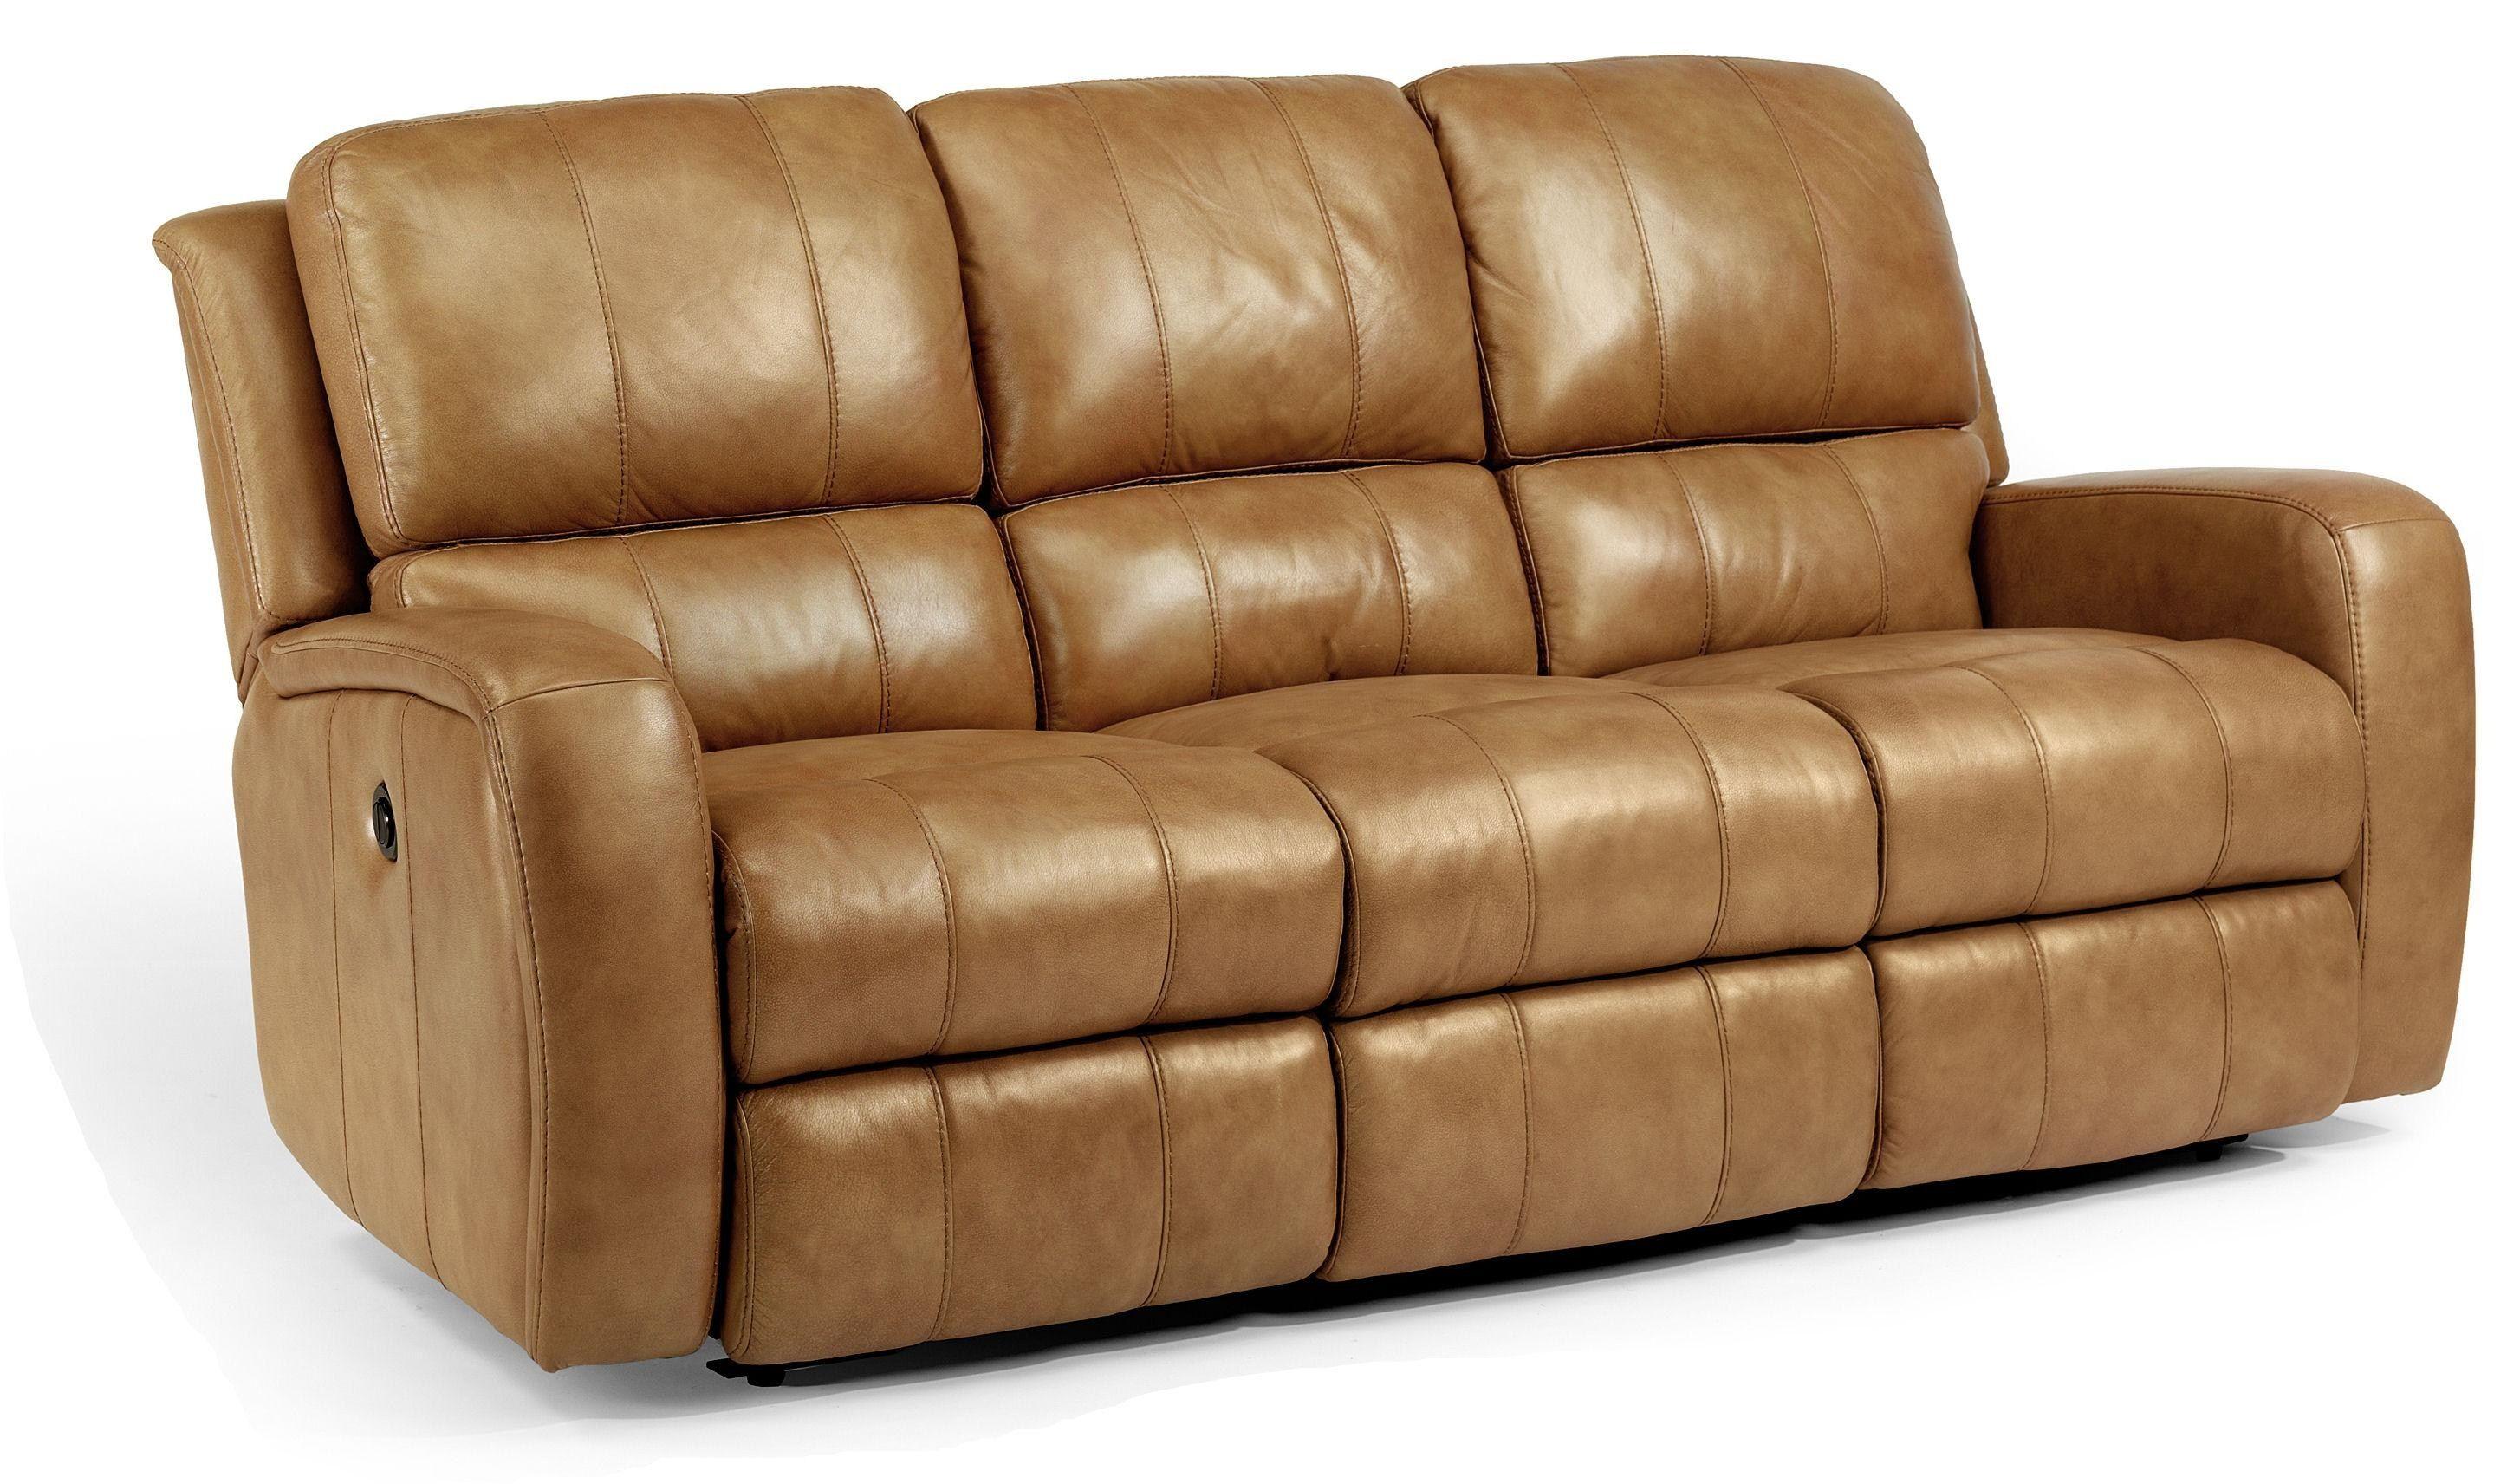 Flexsteel Leather Reclining Sofa Leather Reclining Sofa